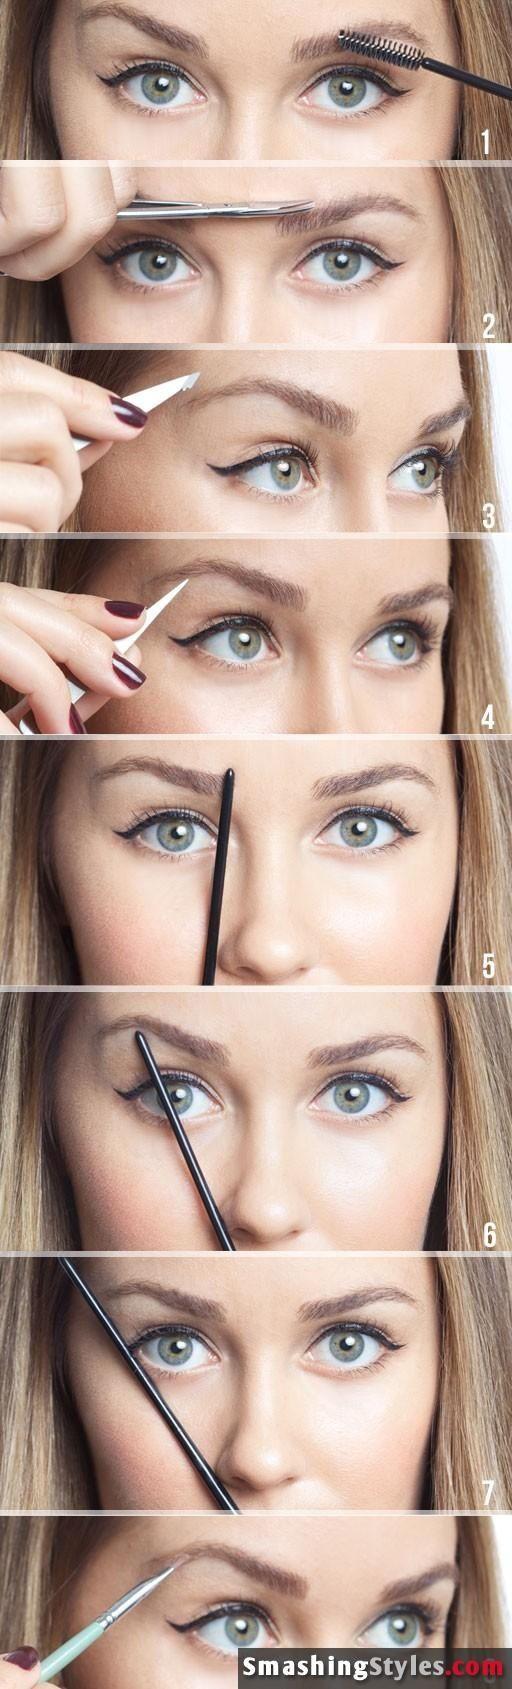 Eye brow trimming---helpful!